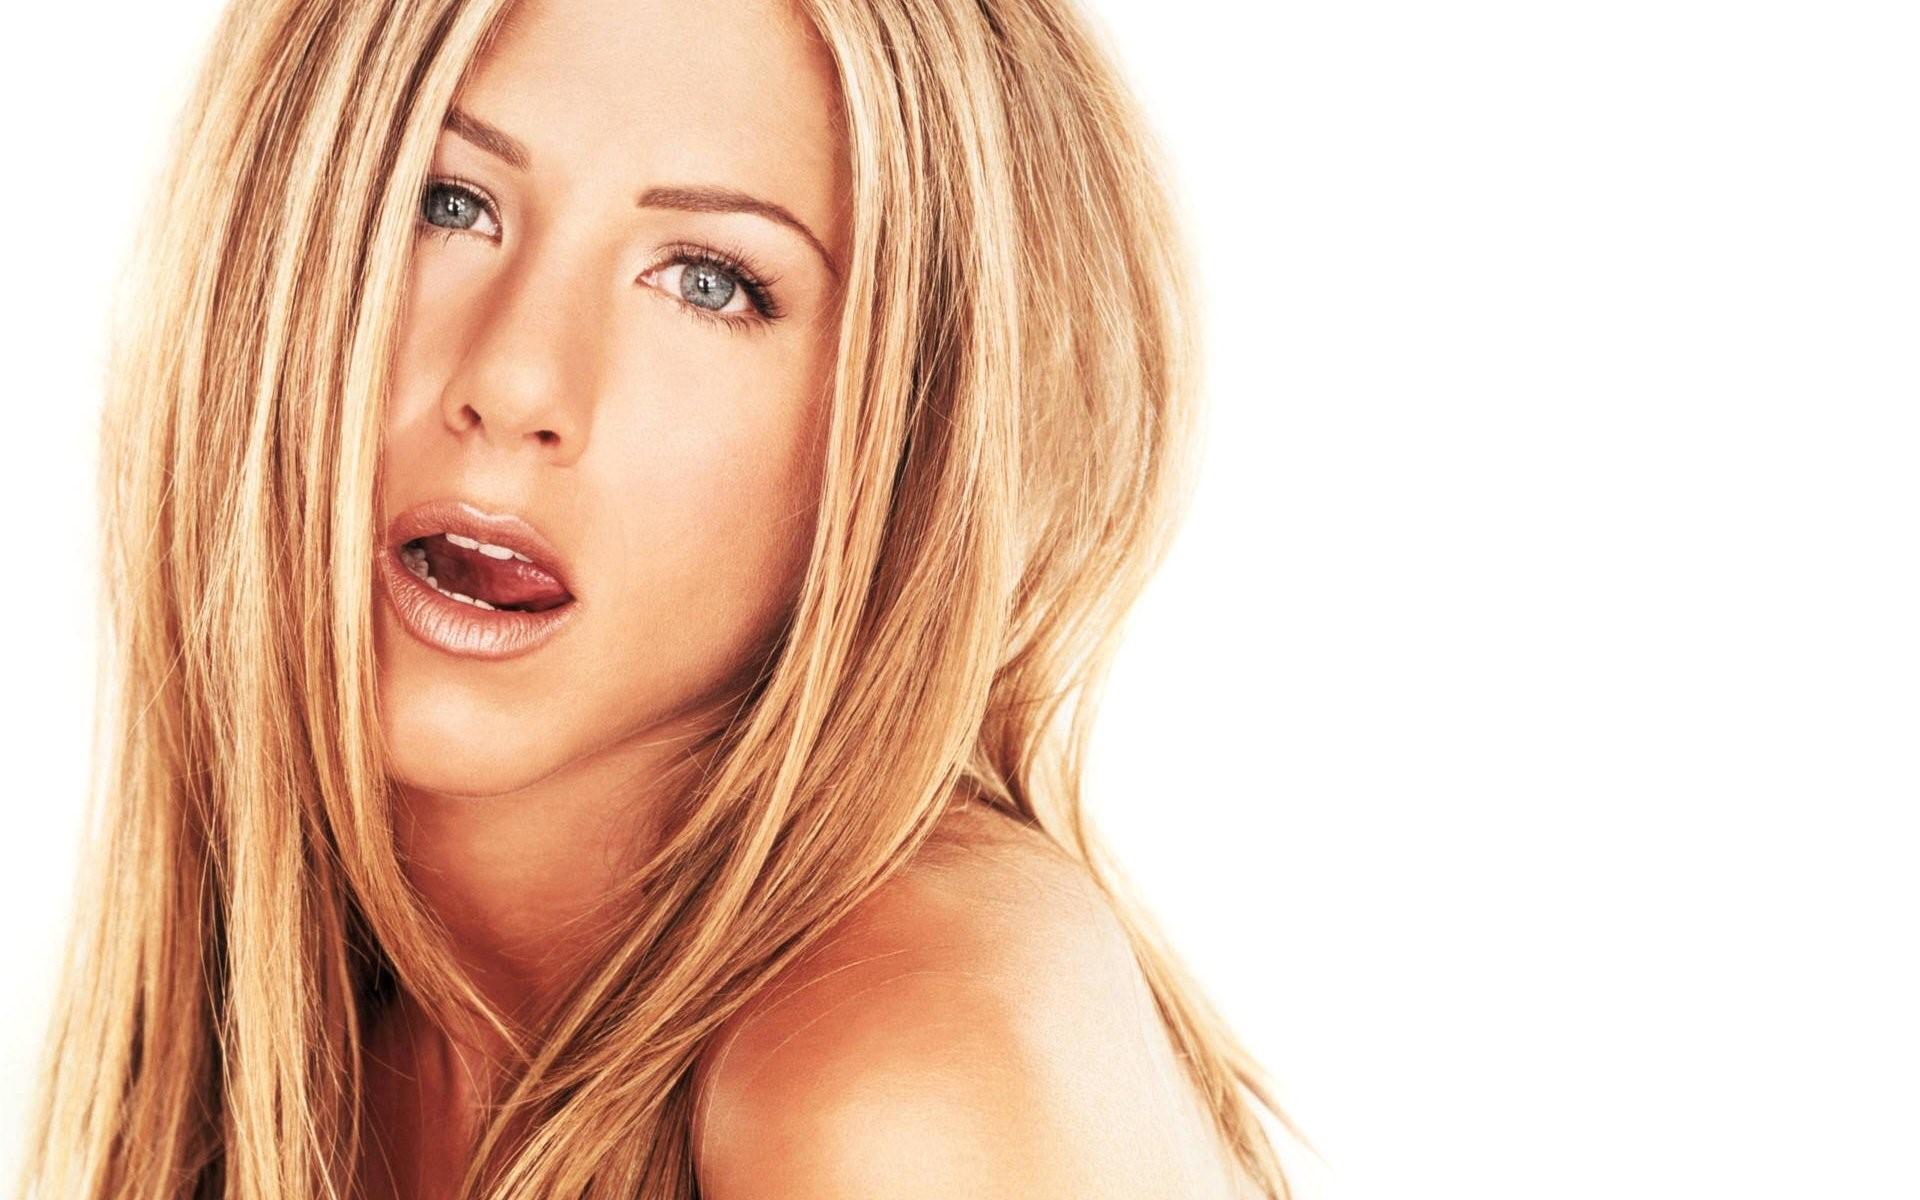 Jennifer Aniston Wallpapers 2